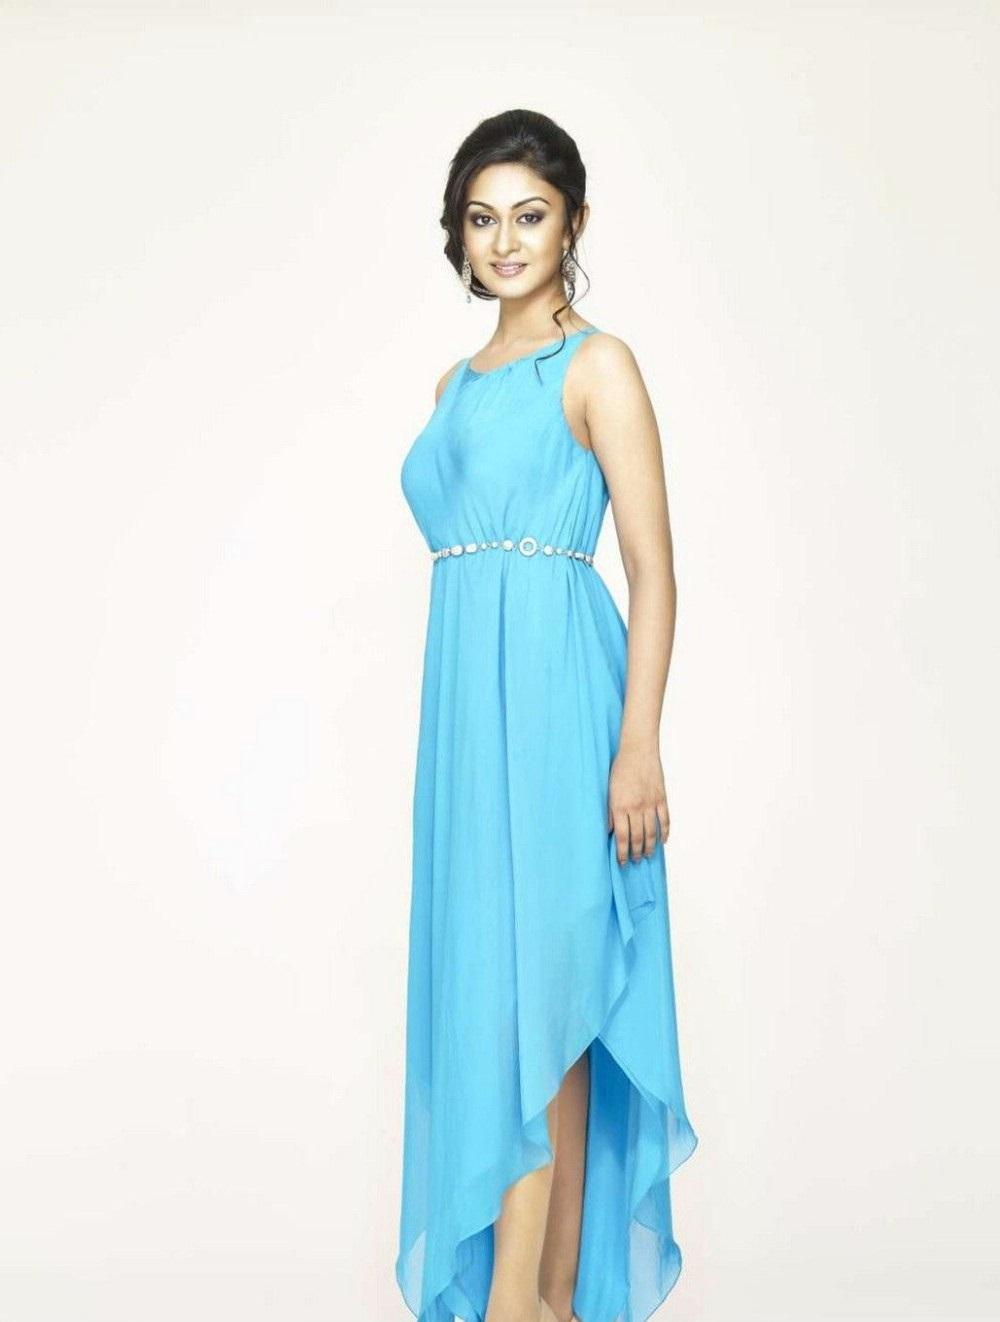 Arjun Daughter Aishwarya Hot Photoshoot Stills